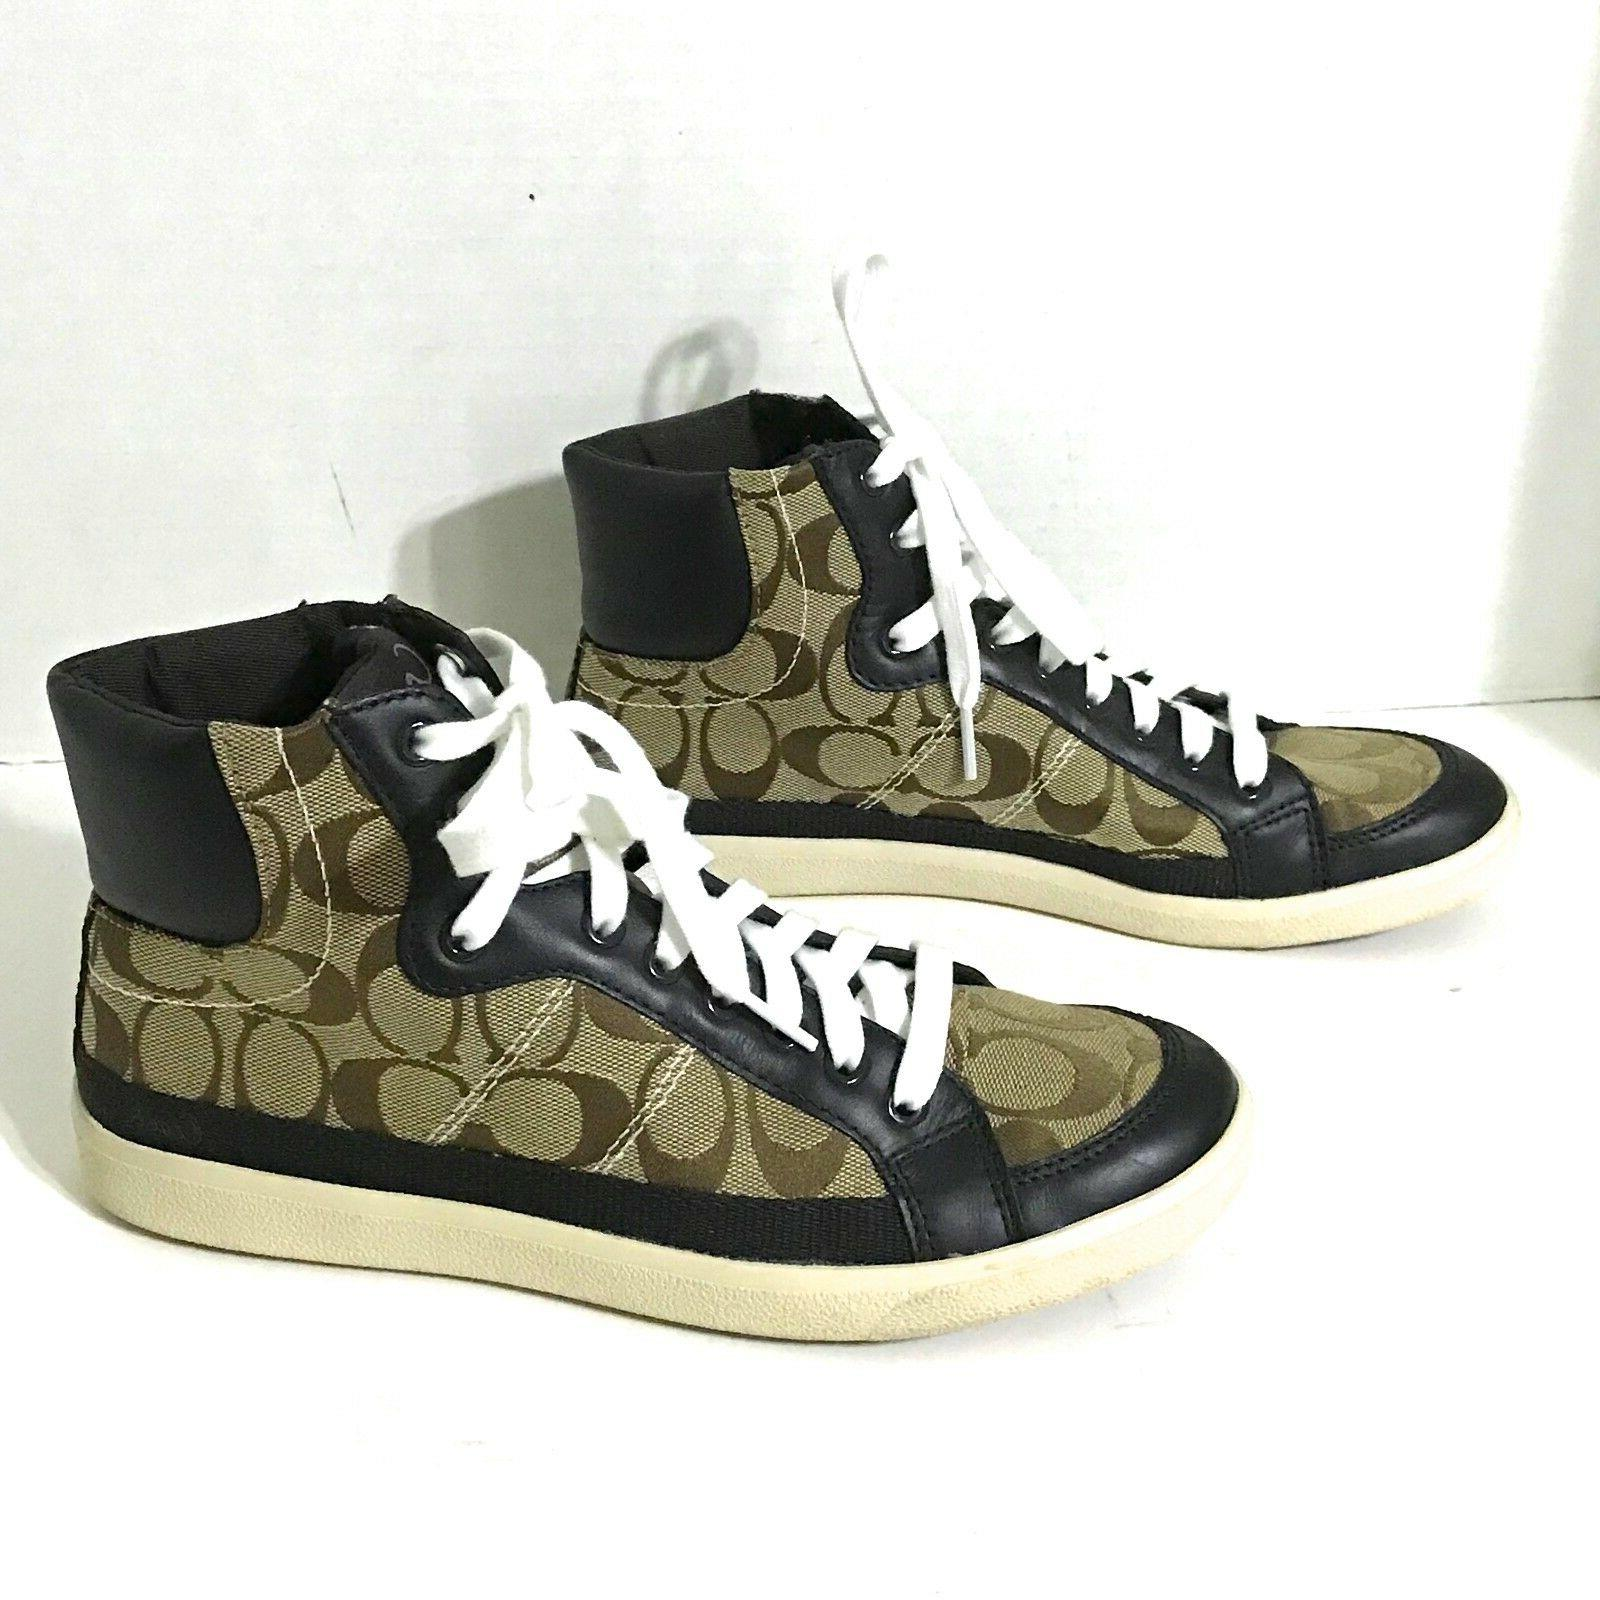 NWOB Coach Ellis Tops Shoes Brown/Tan / BRAND